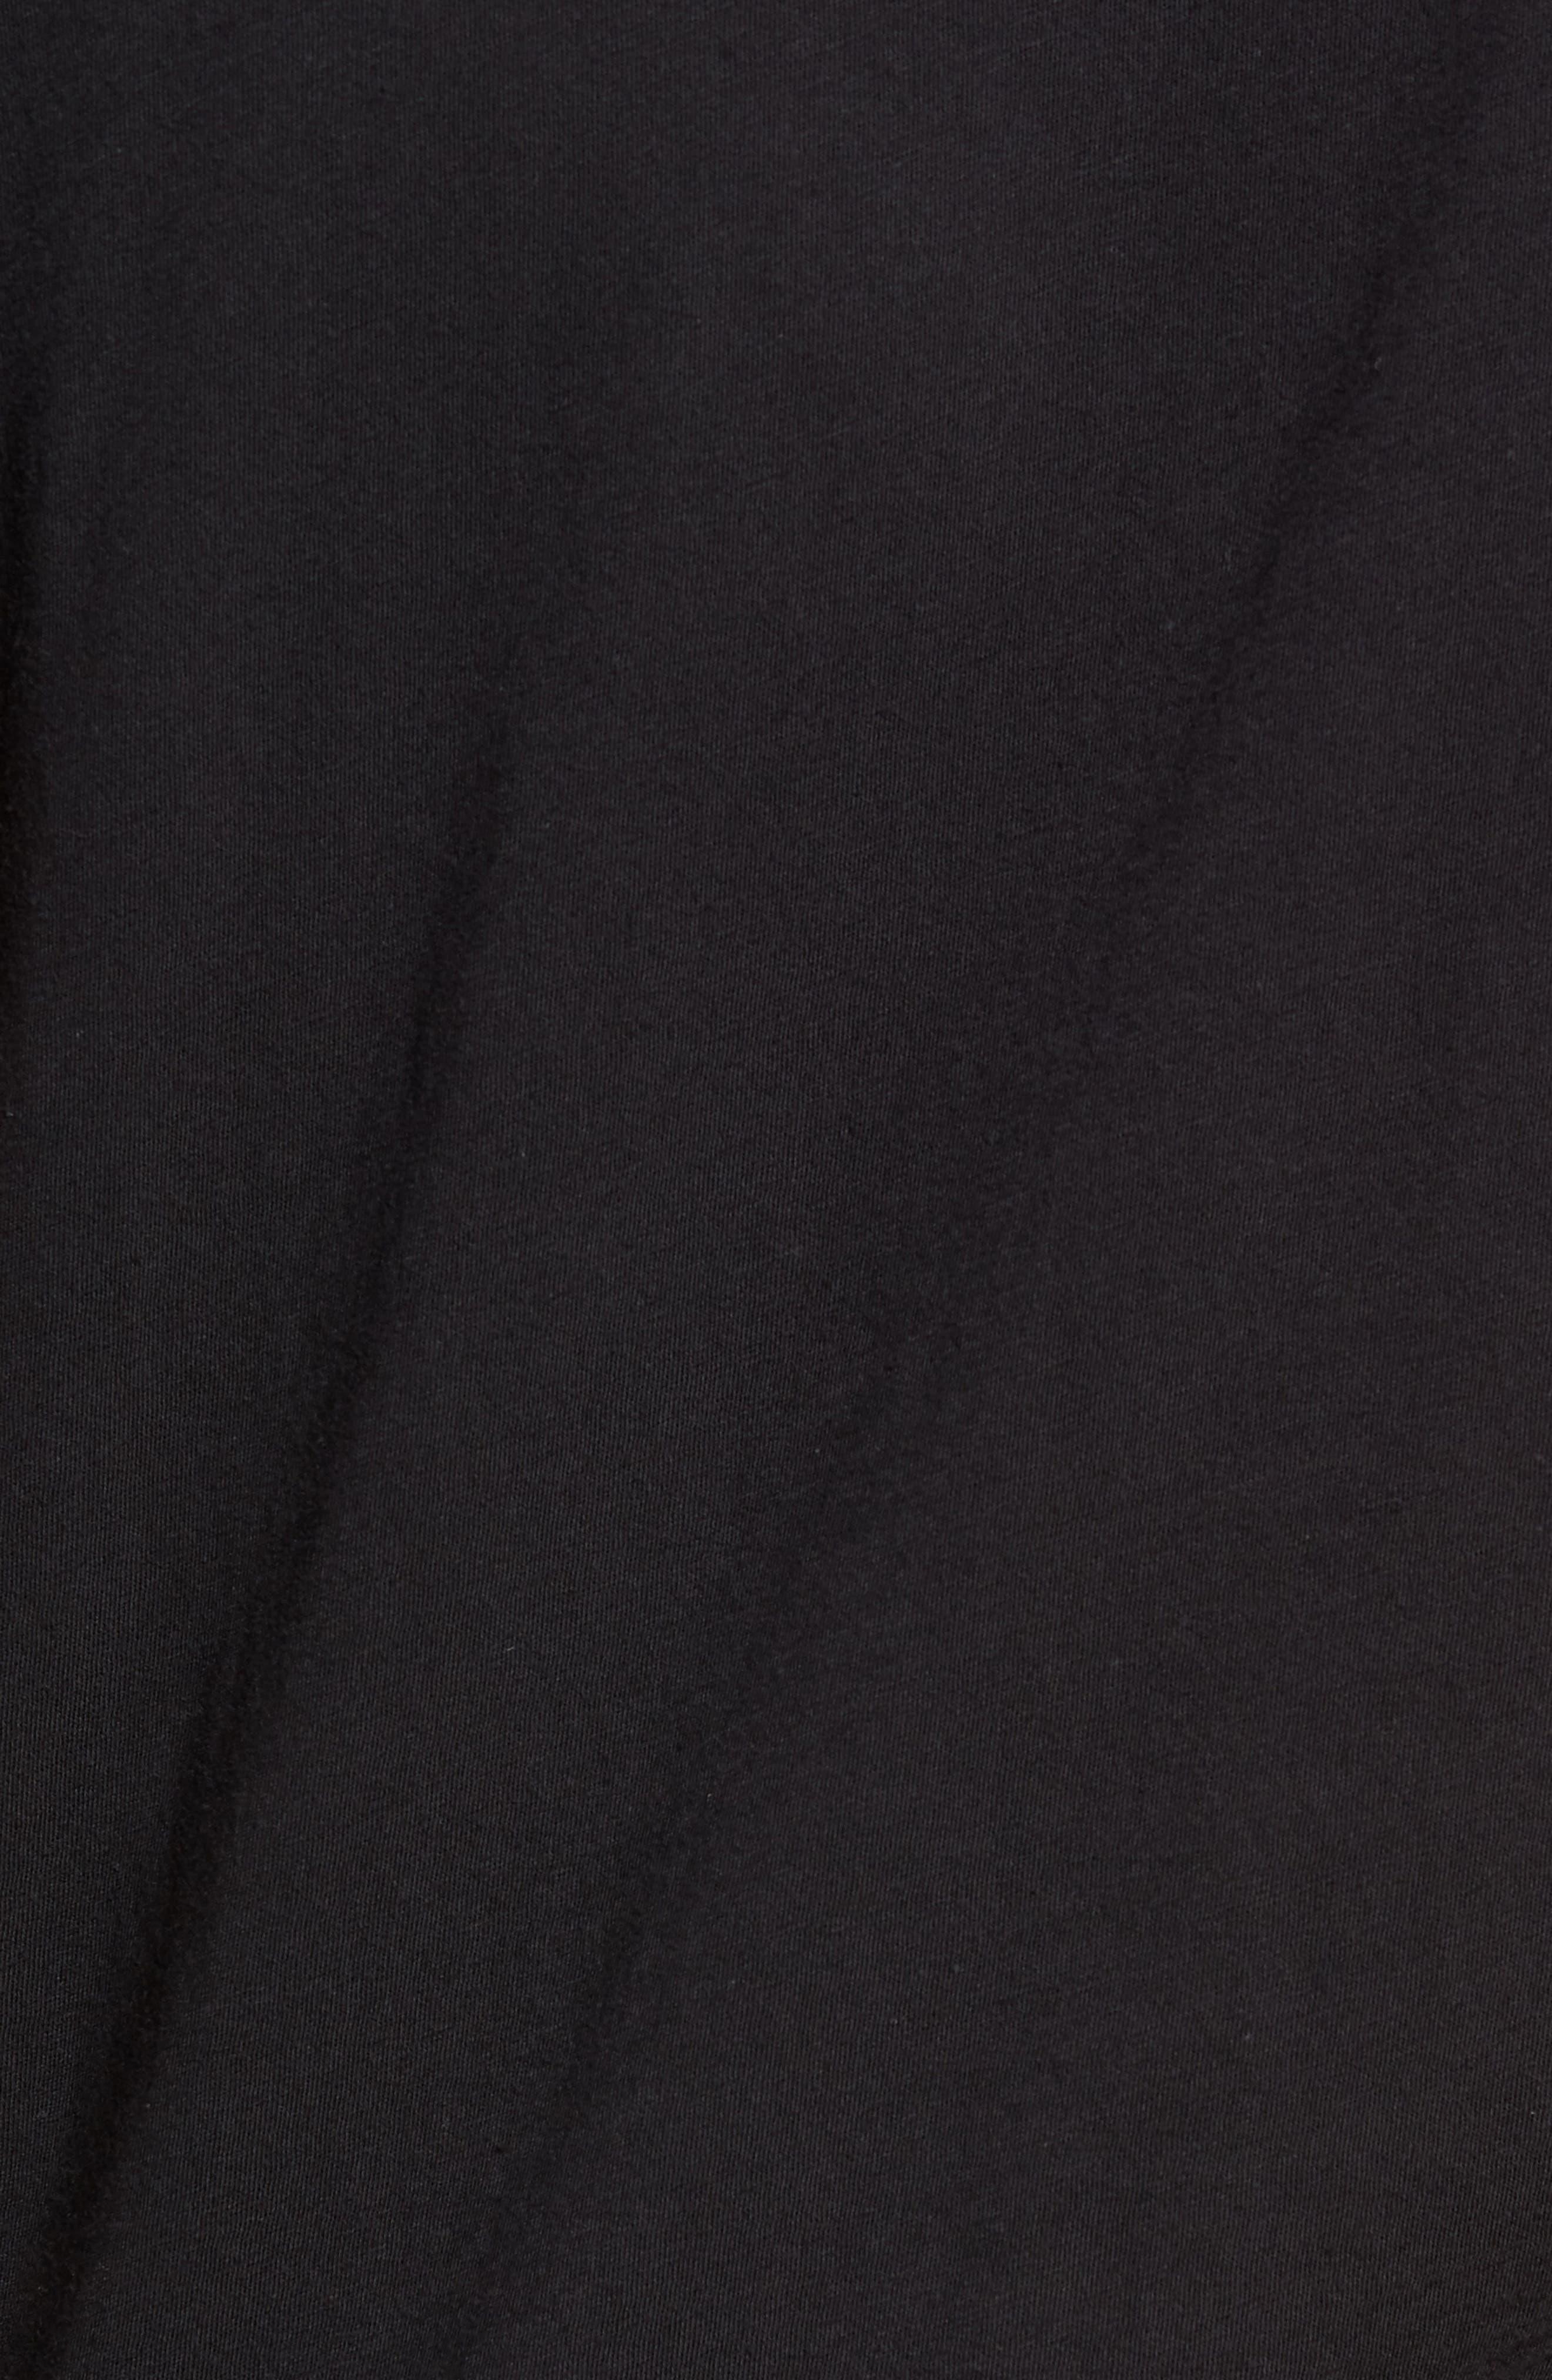 Slim Fit Crewneck T-Shirt,                             Alternate thumbnail 6, color,                             Jet Black